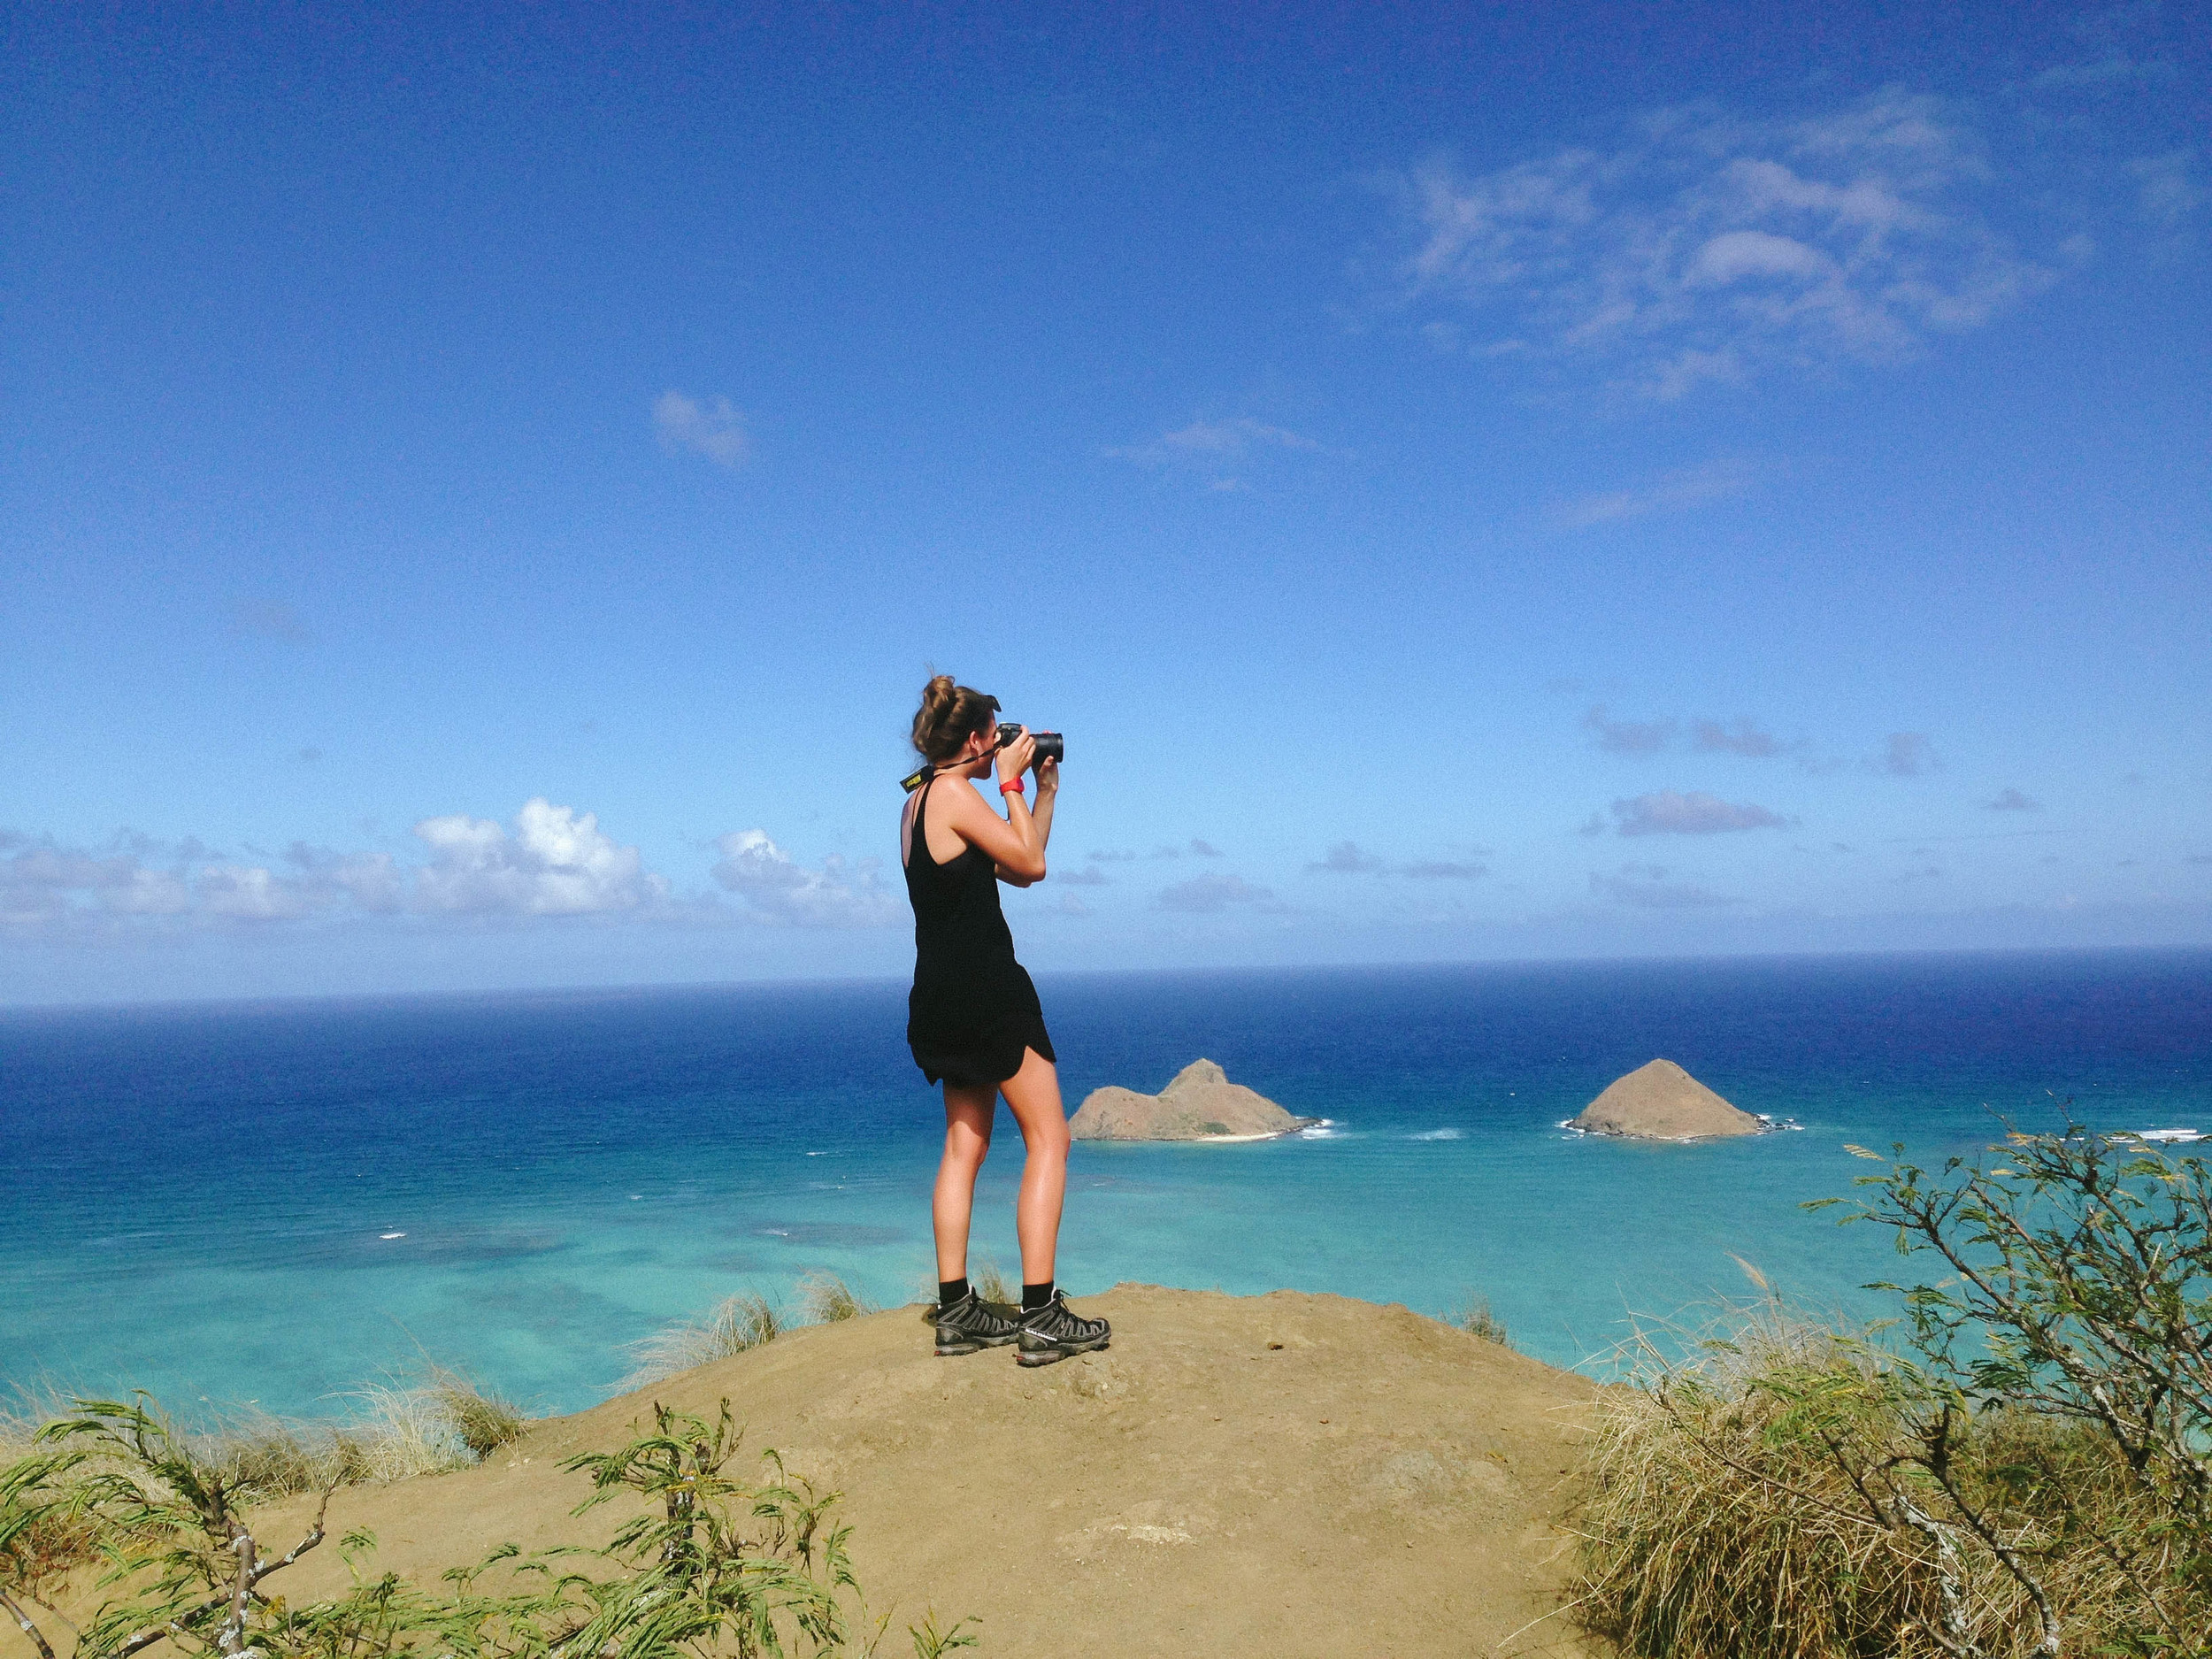 Jess documenting our Pill Box hike, Oahu.